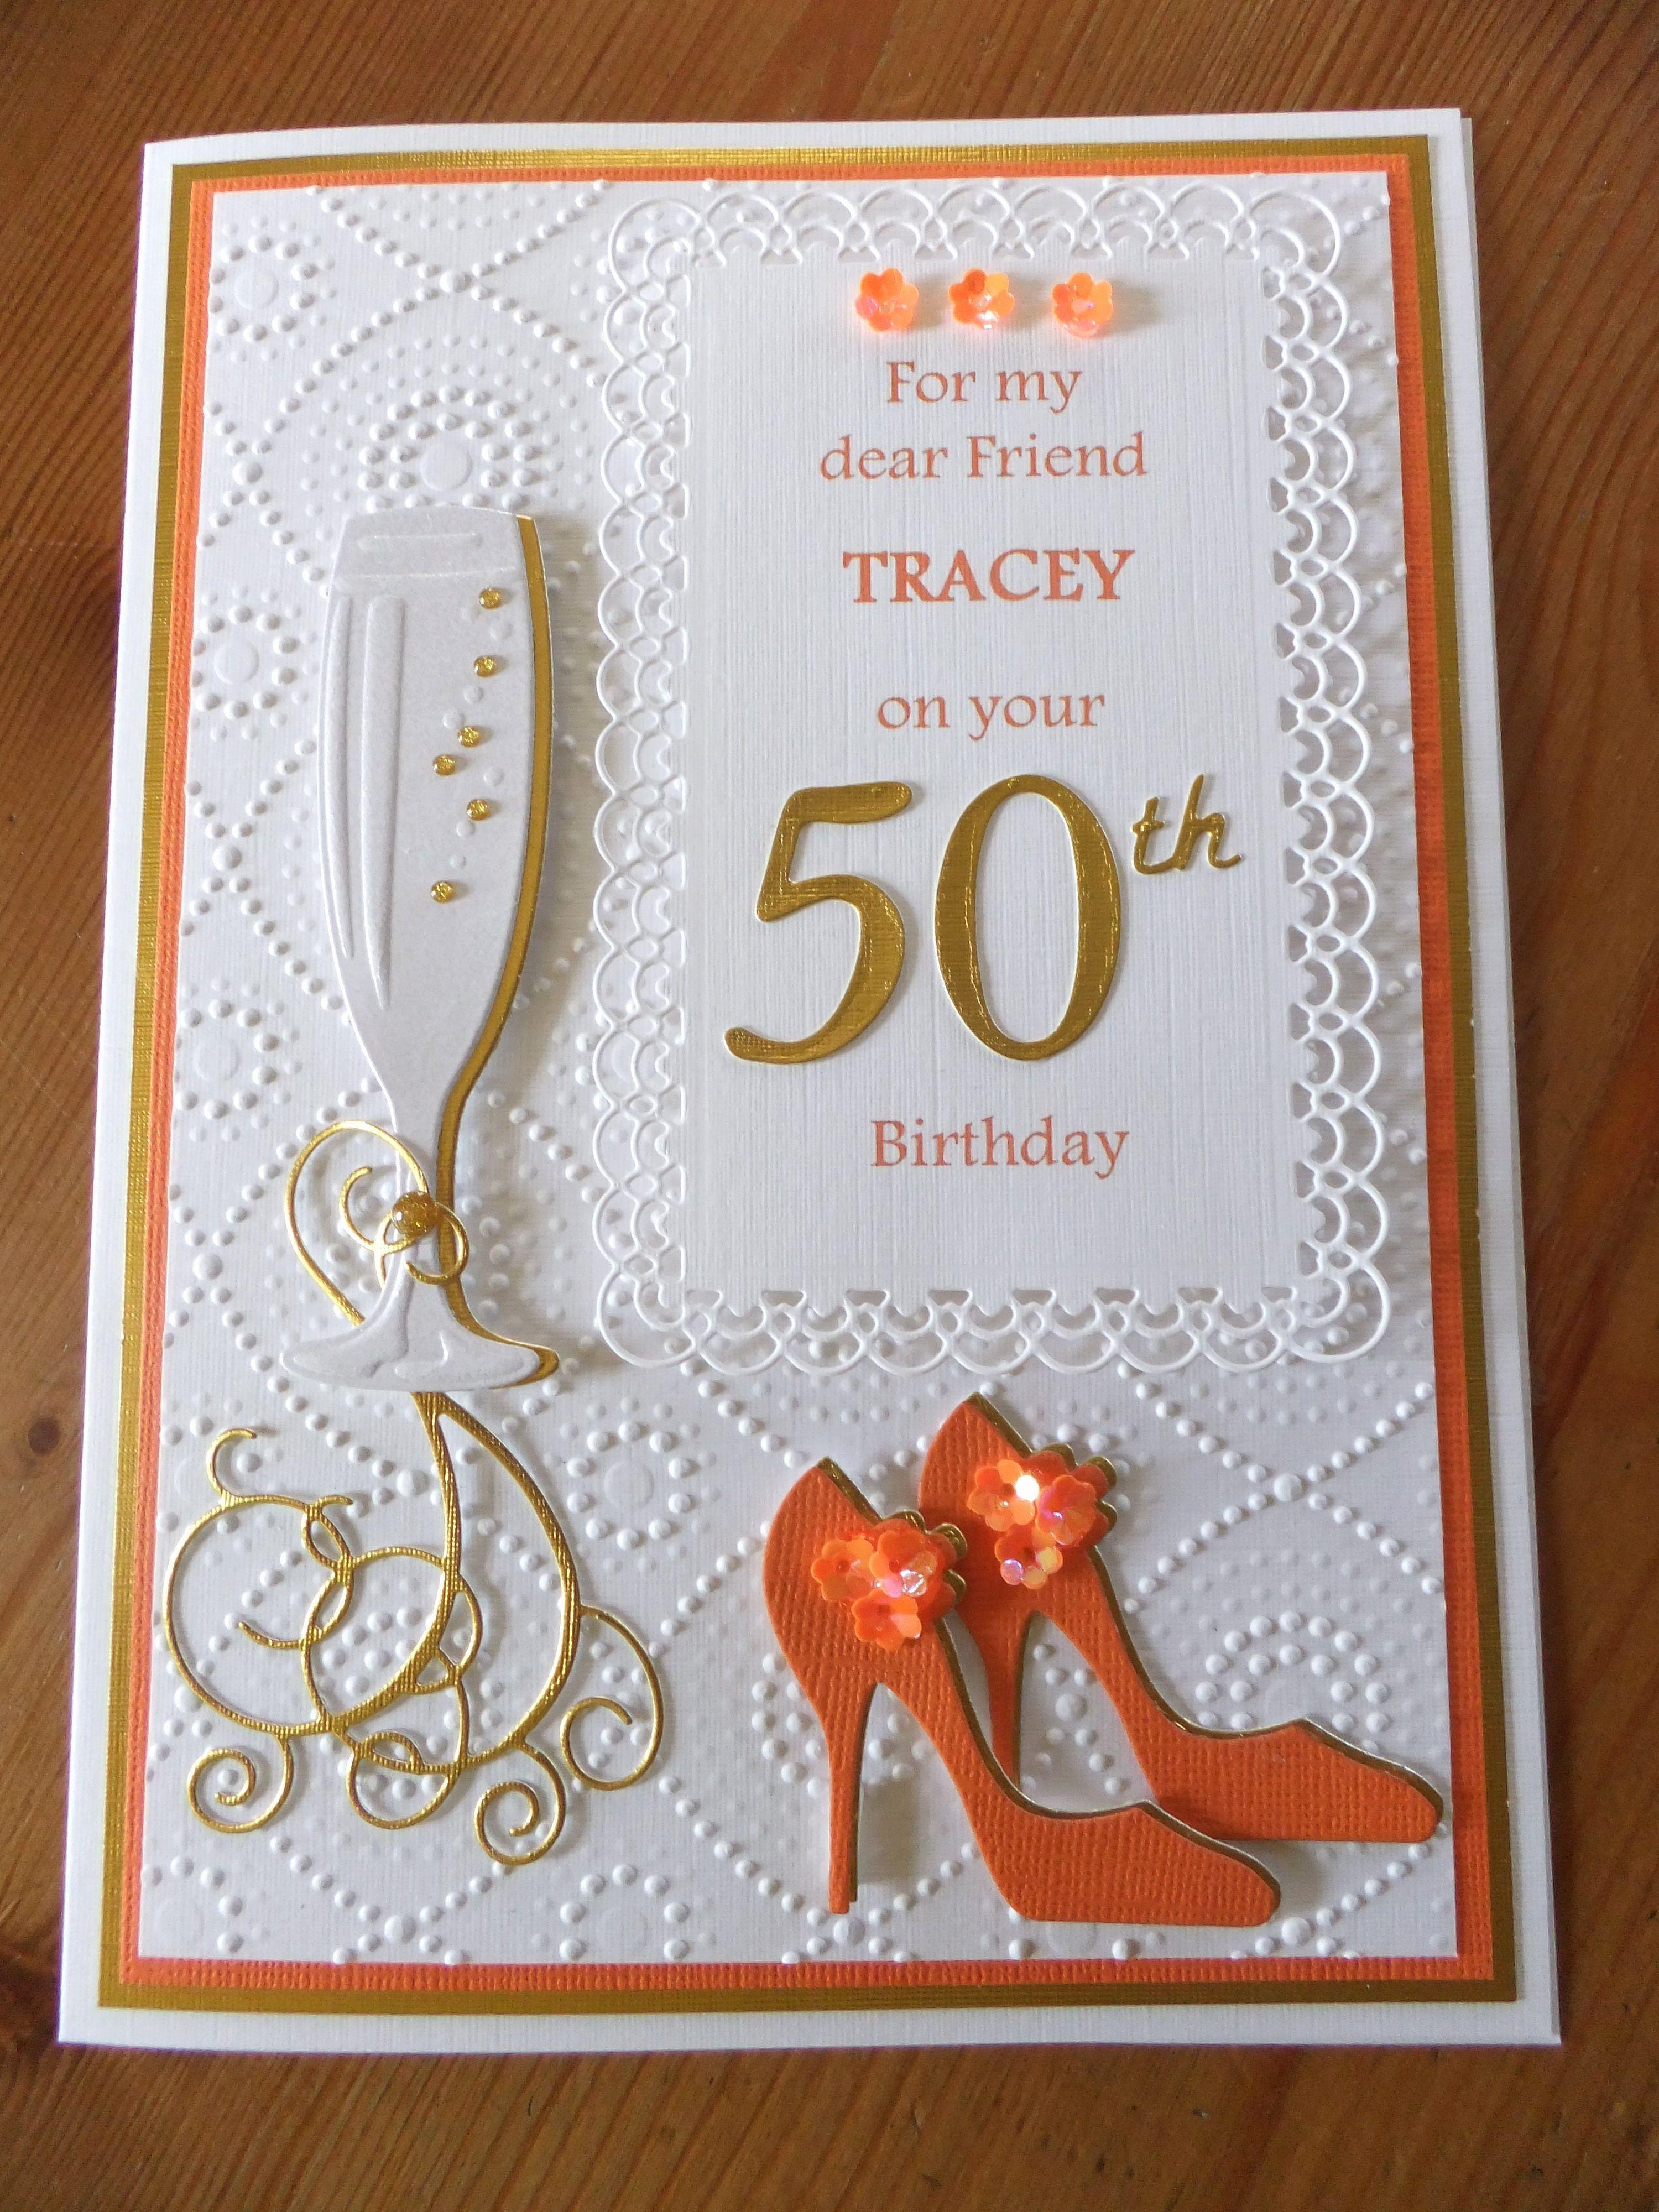 Happy 50th Birthday Cards Best Of 50th Birthday Using A Variety Of S Cards 50th Birthday Cards For Women Birthday Cards For Women 60th Birthday Cards